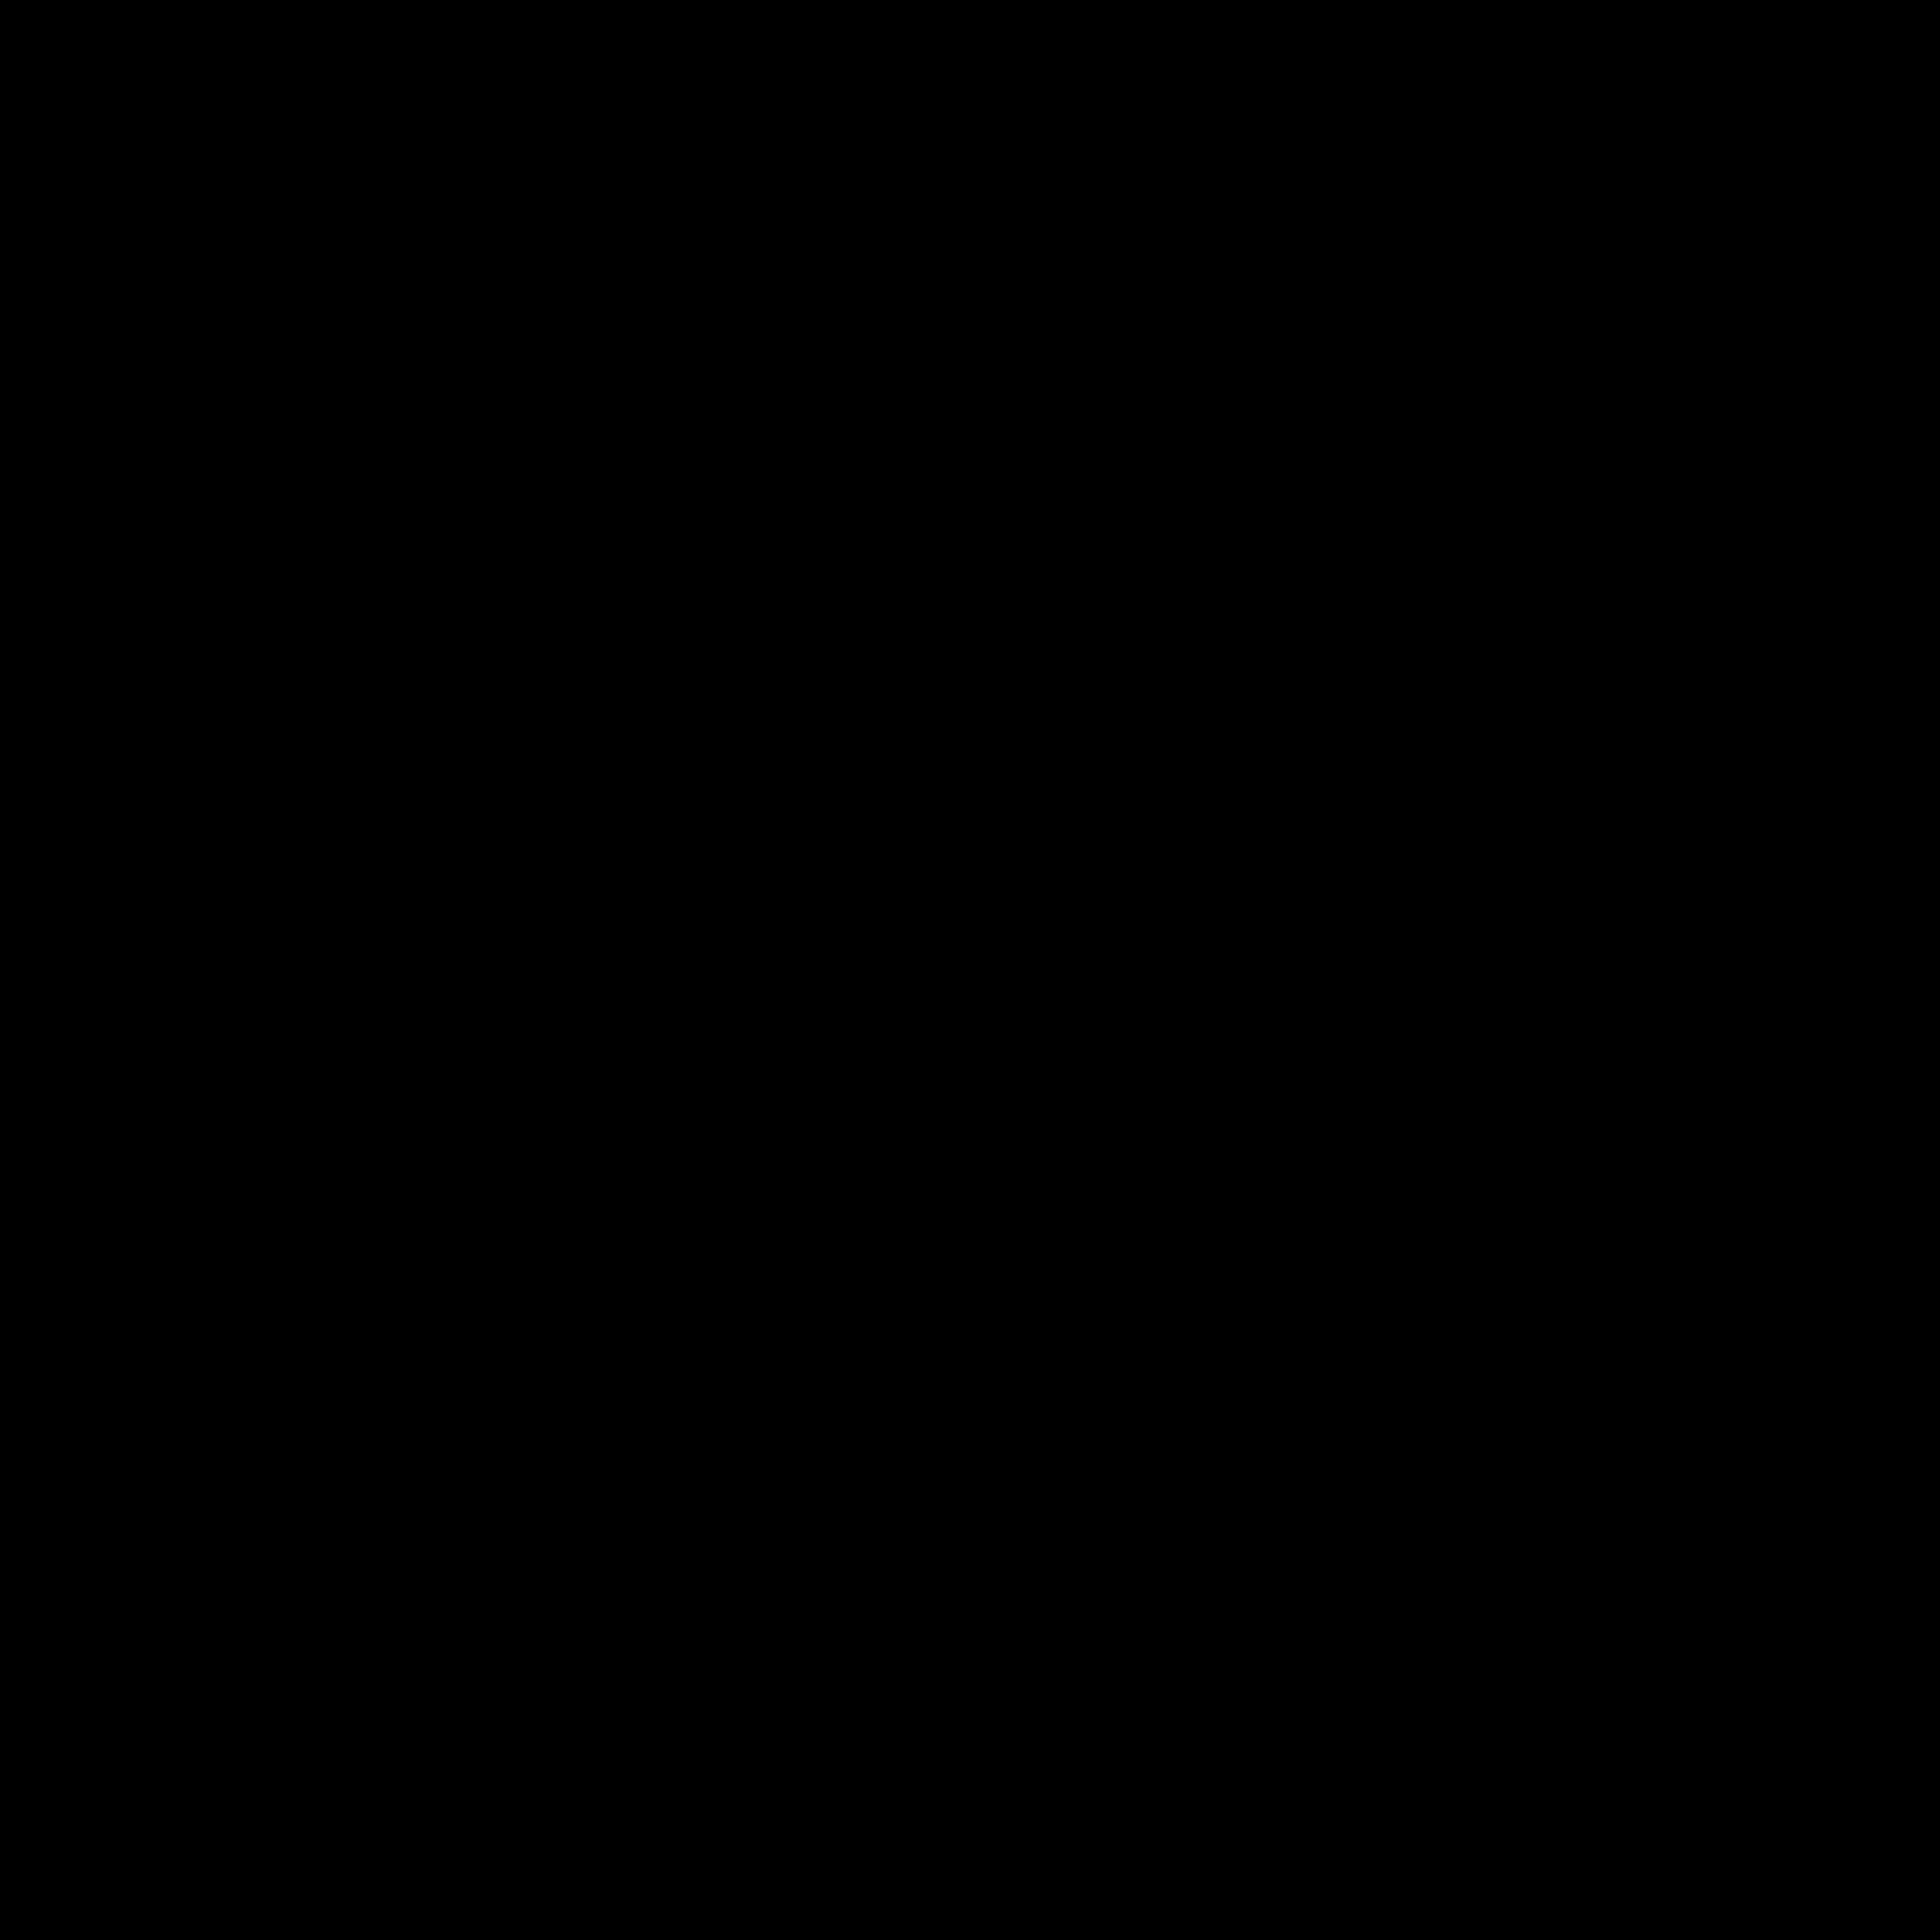 Gears clipart transparent background Clipart svg icon Art Clip